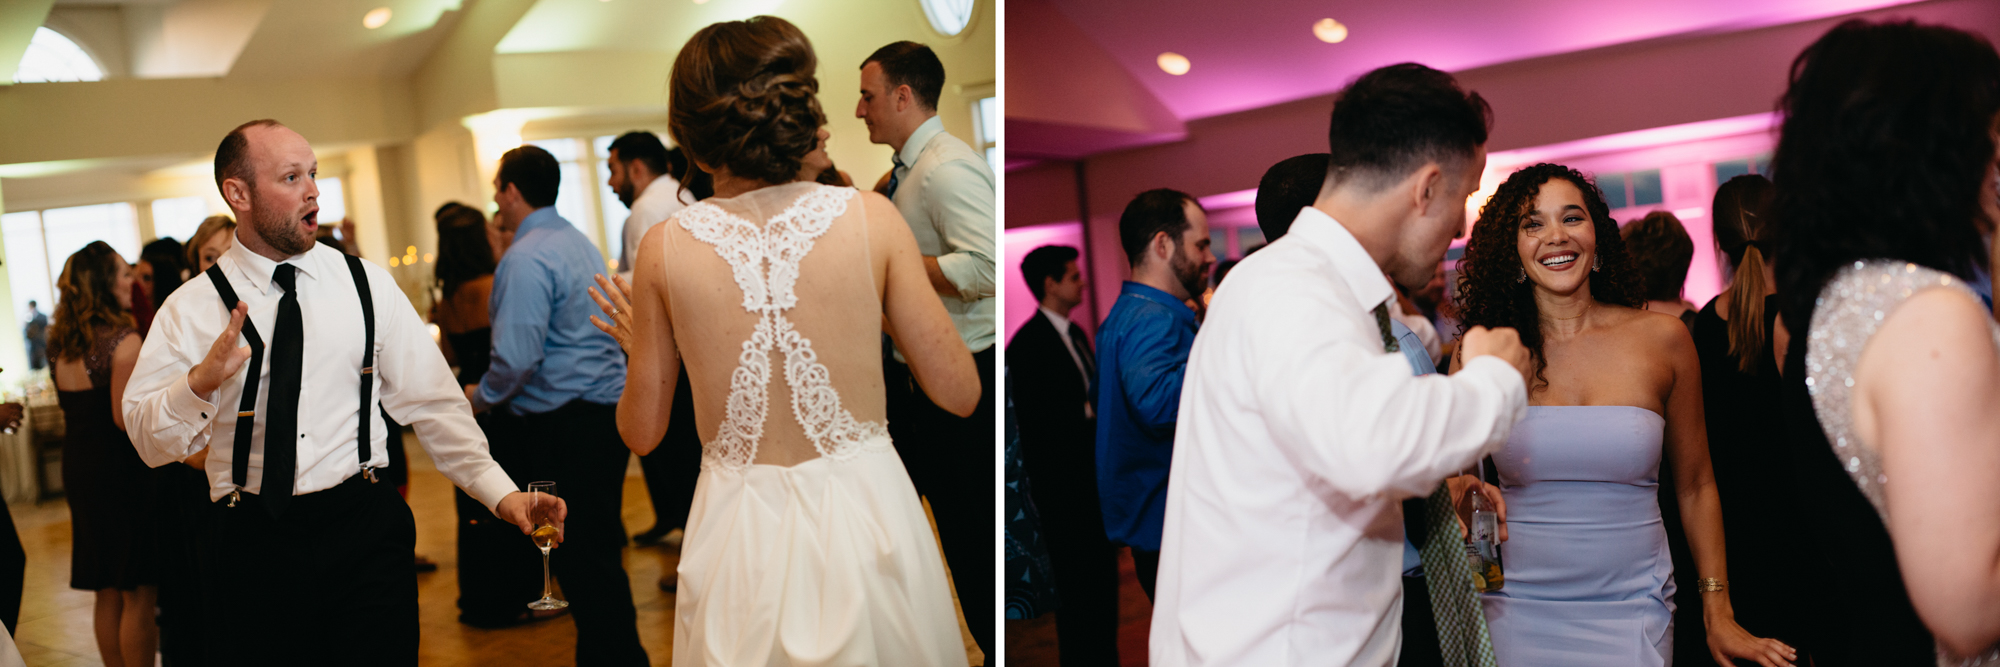 Jaclyn_Andrew_quincy_massachusetts_wedding034.jpg